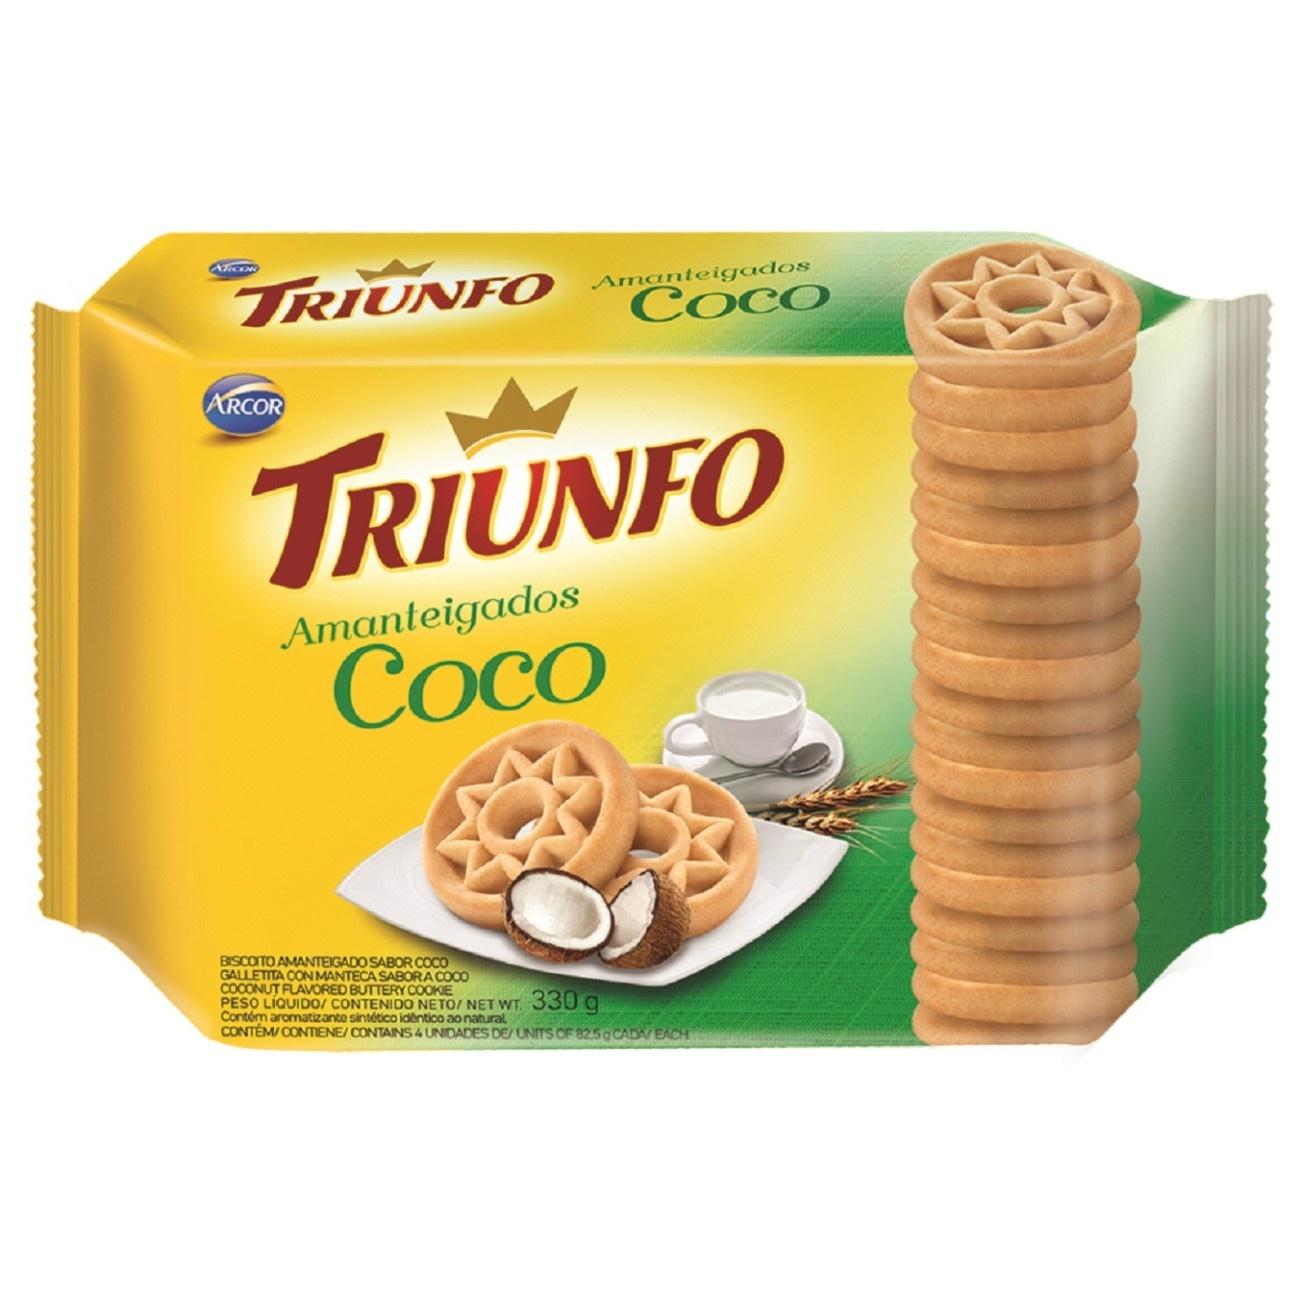 Biscoito Triunfo Amanteigado Coco 330g Multipack